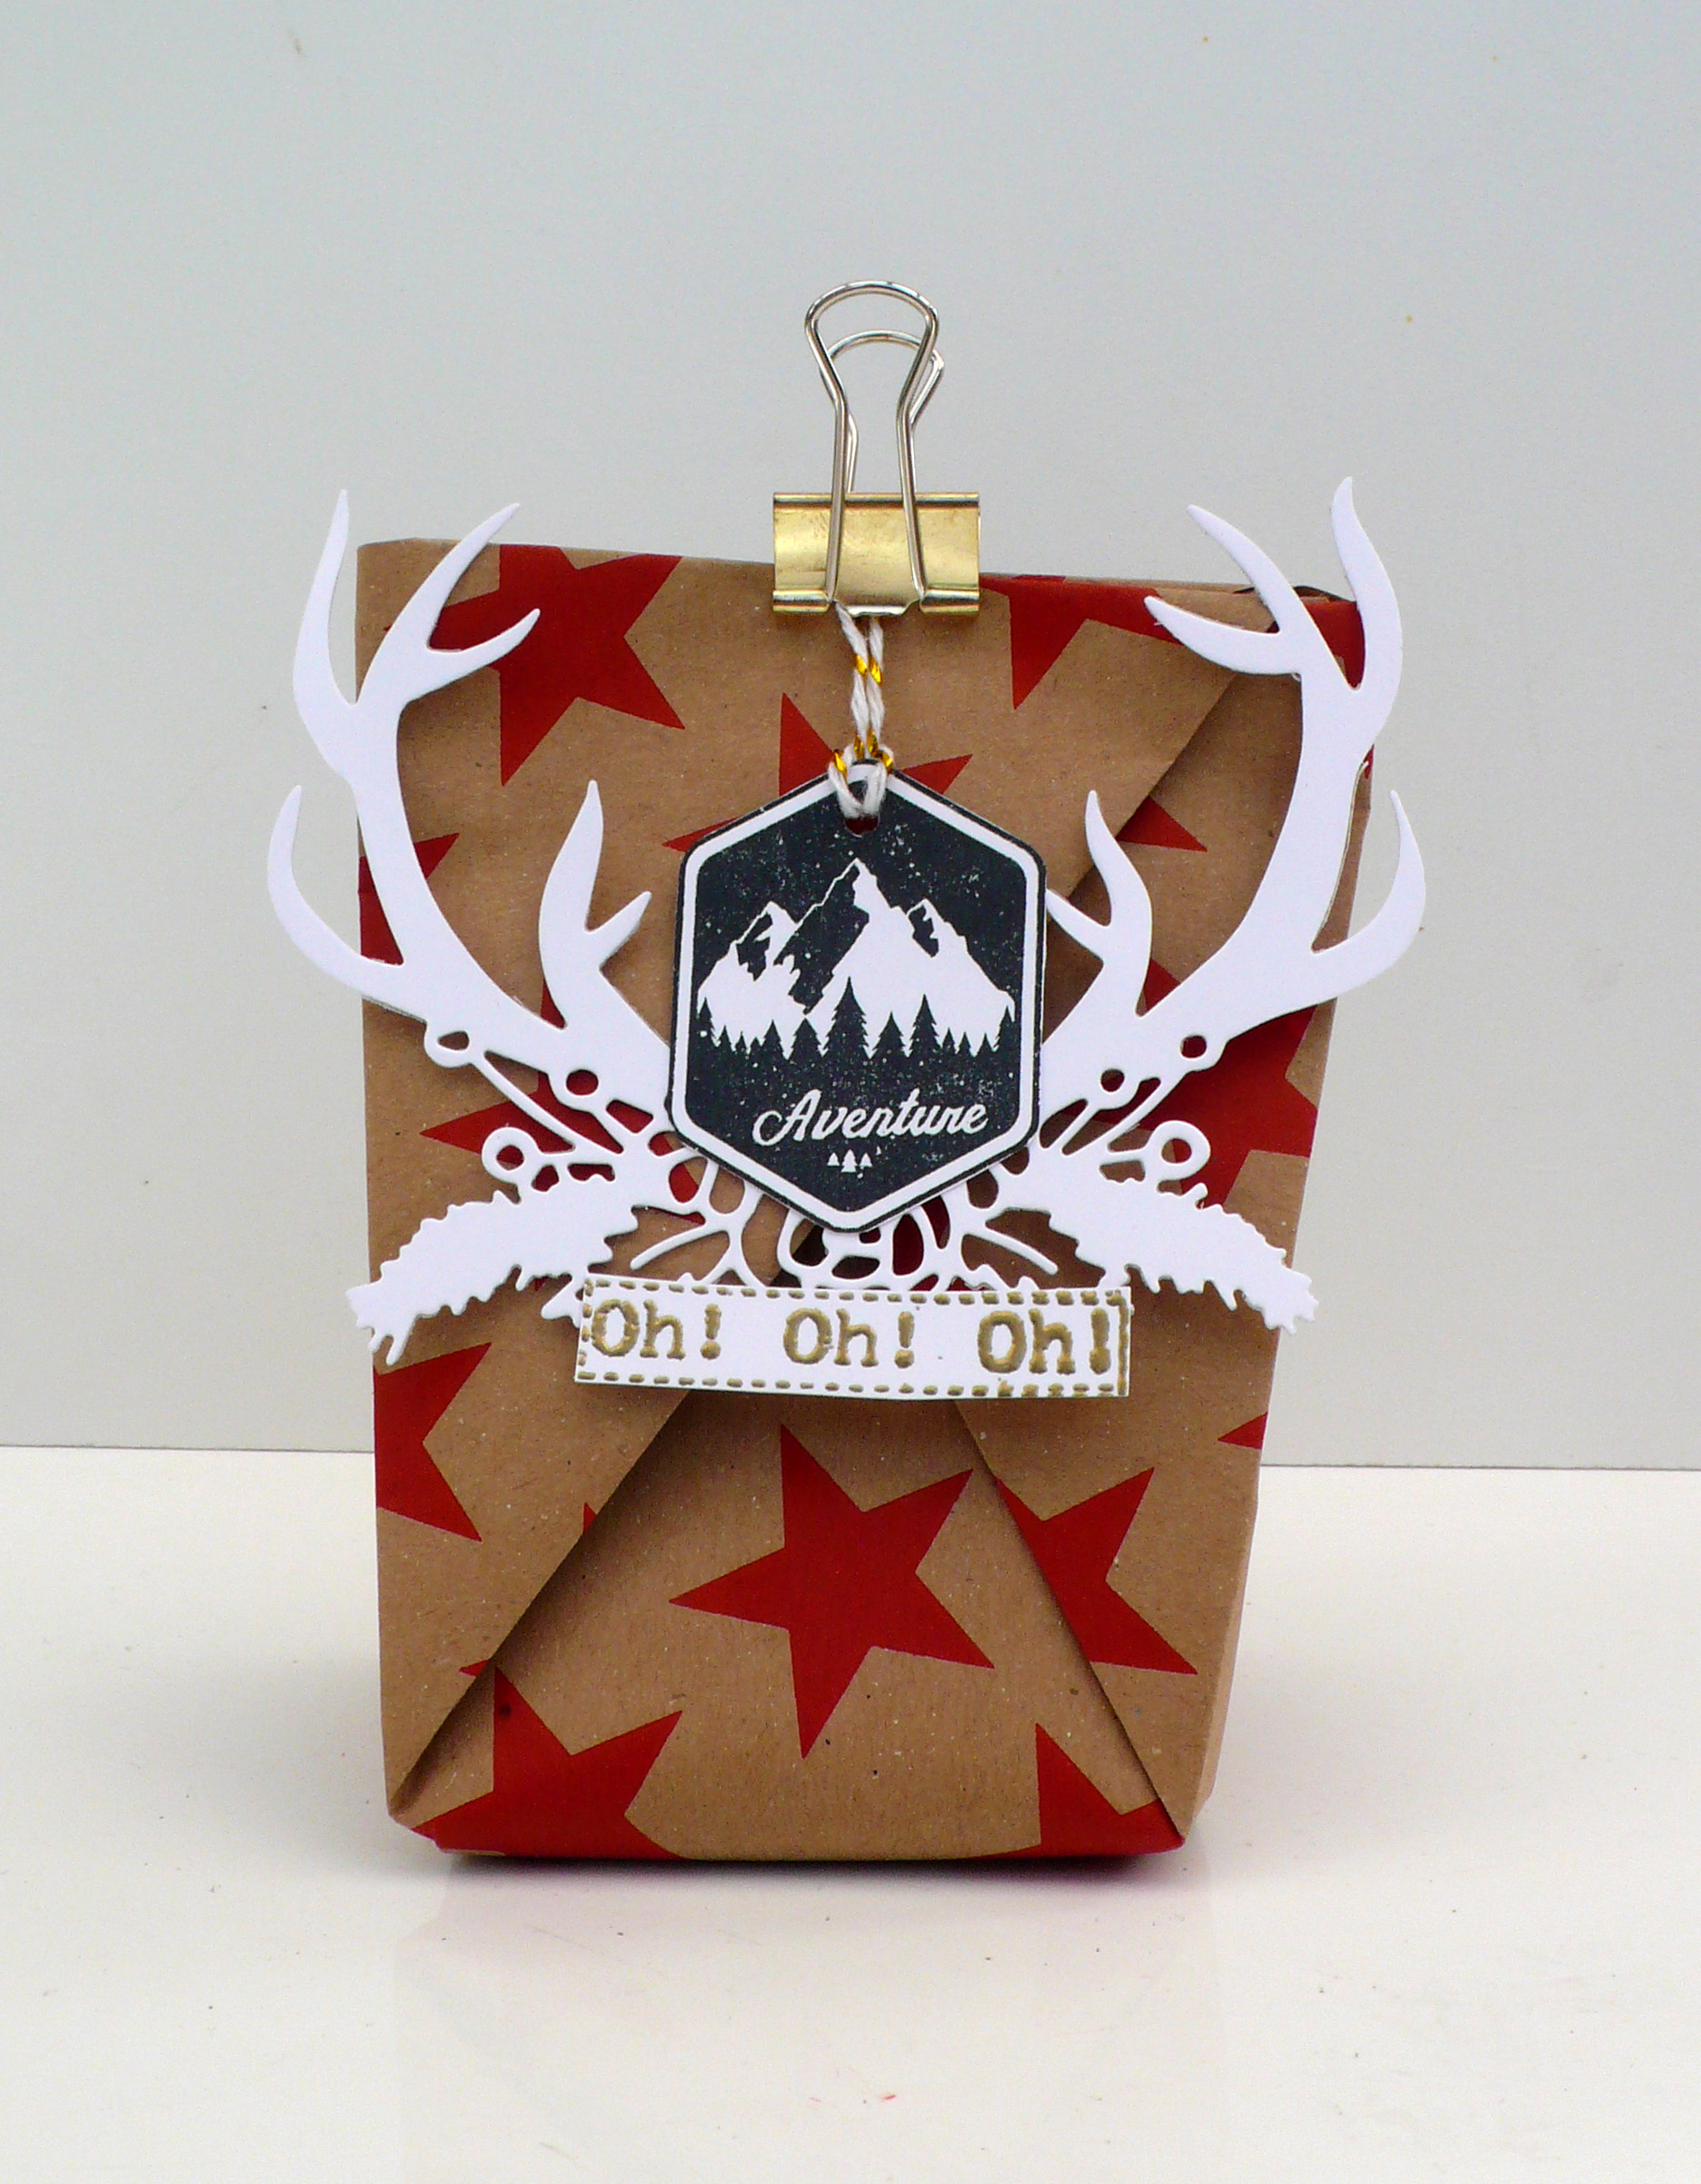 préparer noel emballage origami original 2